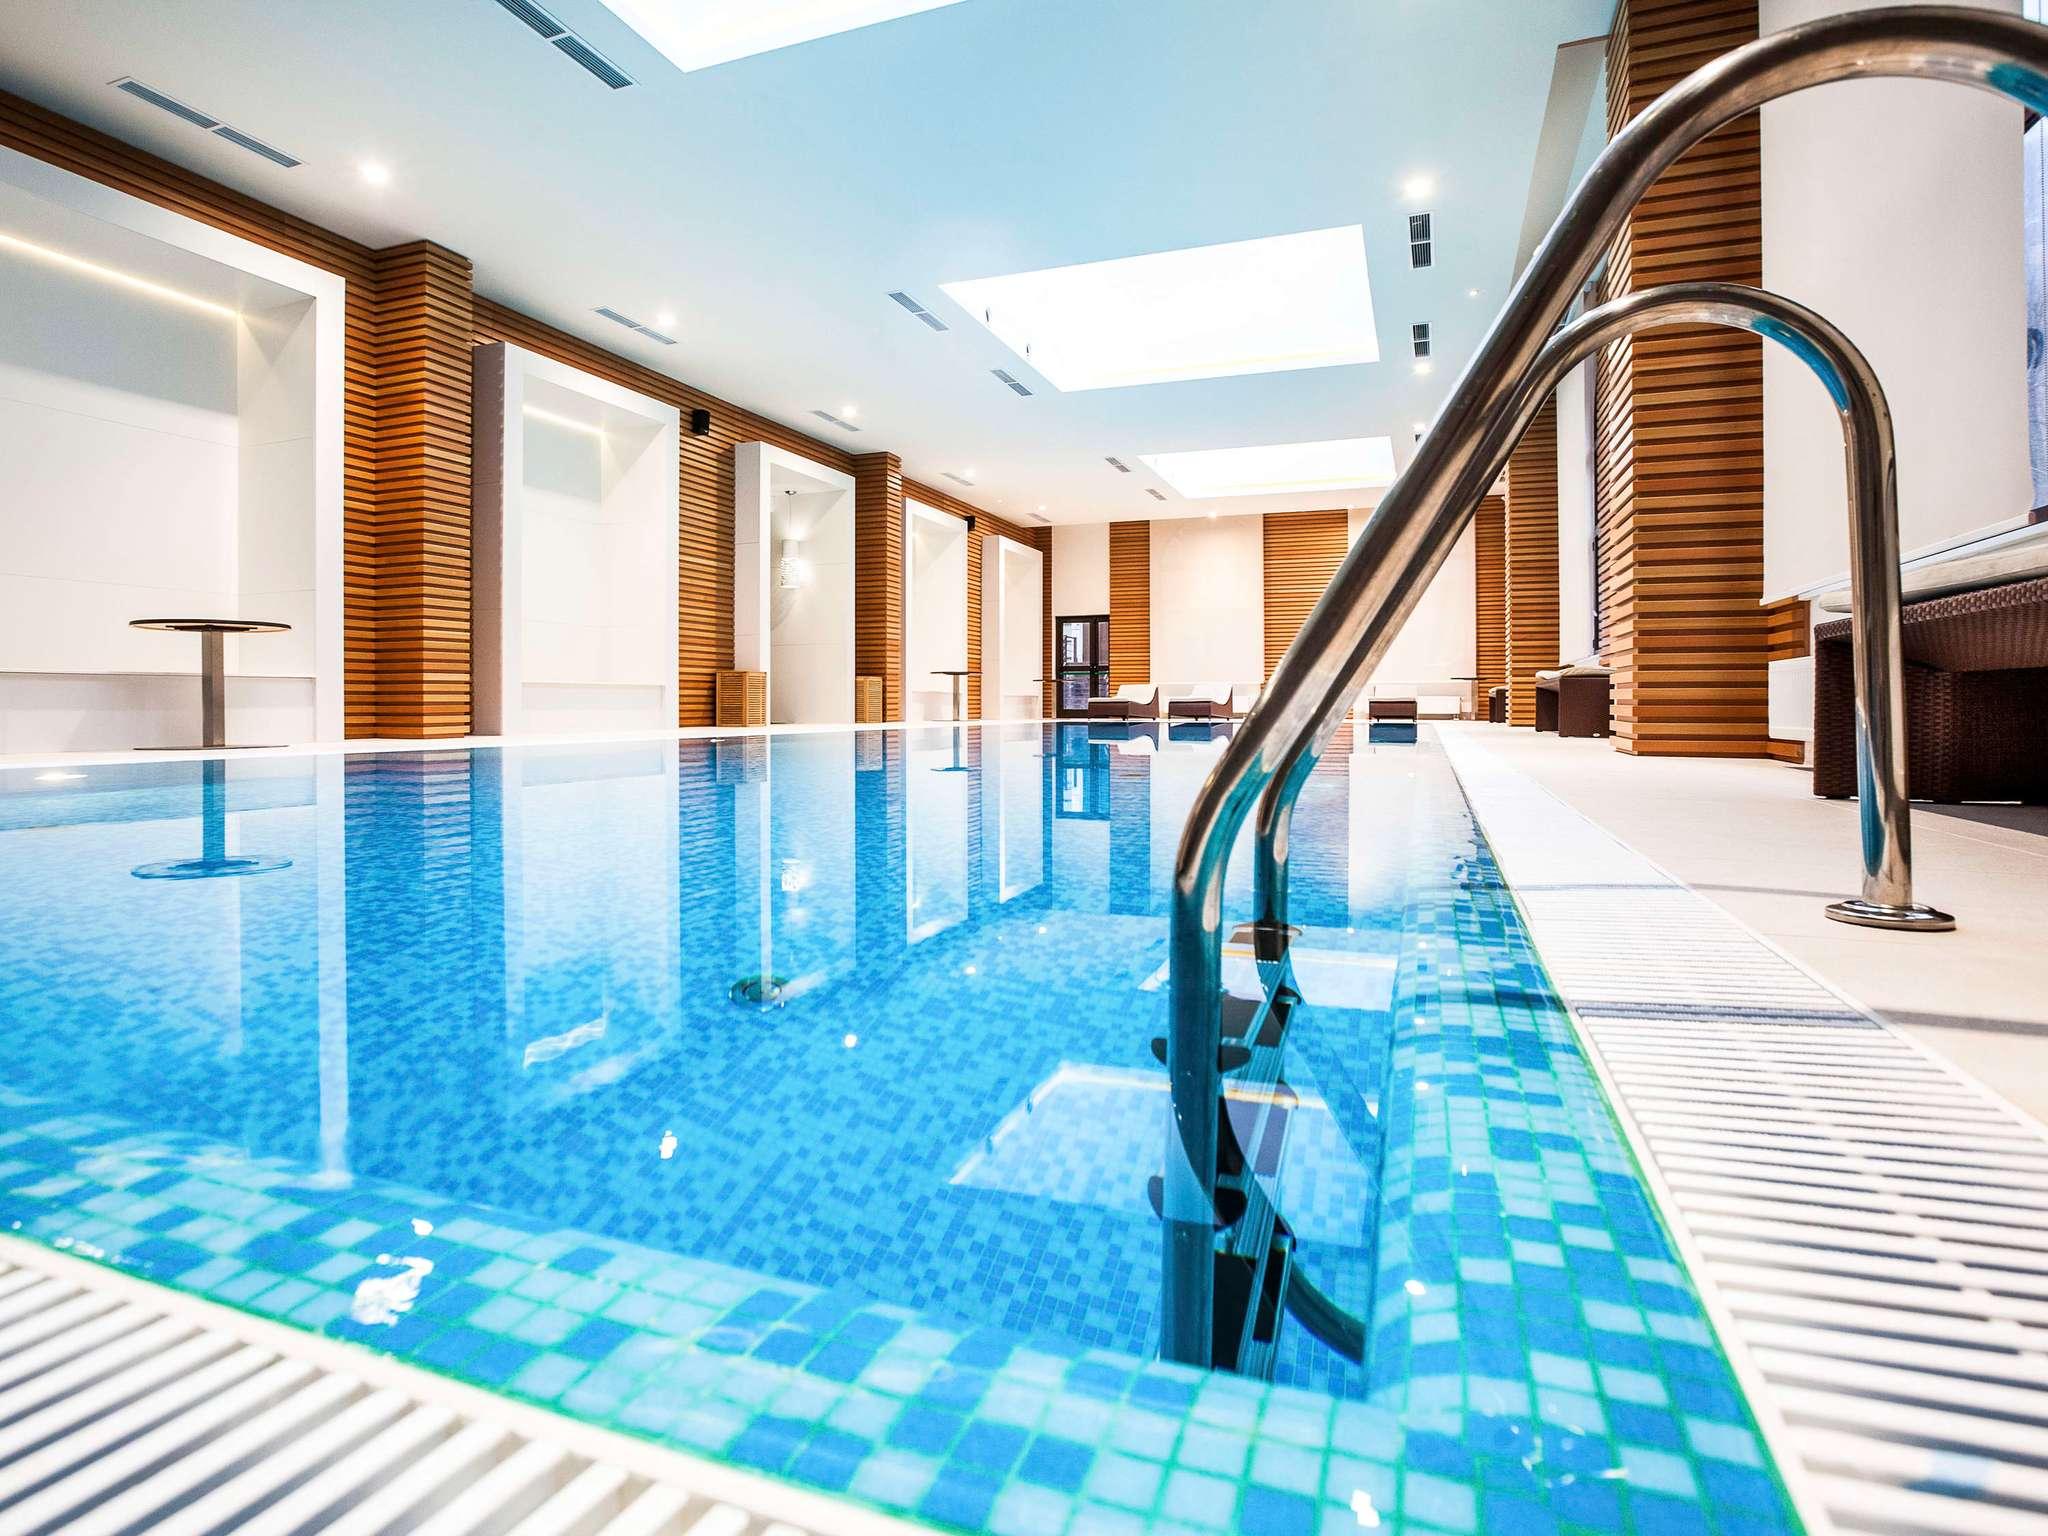 Hotel - Mercure Rosa Khutor Hotel